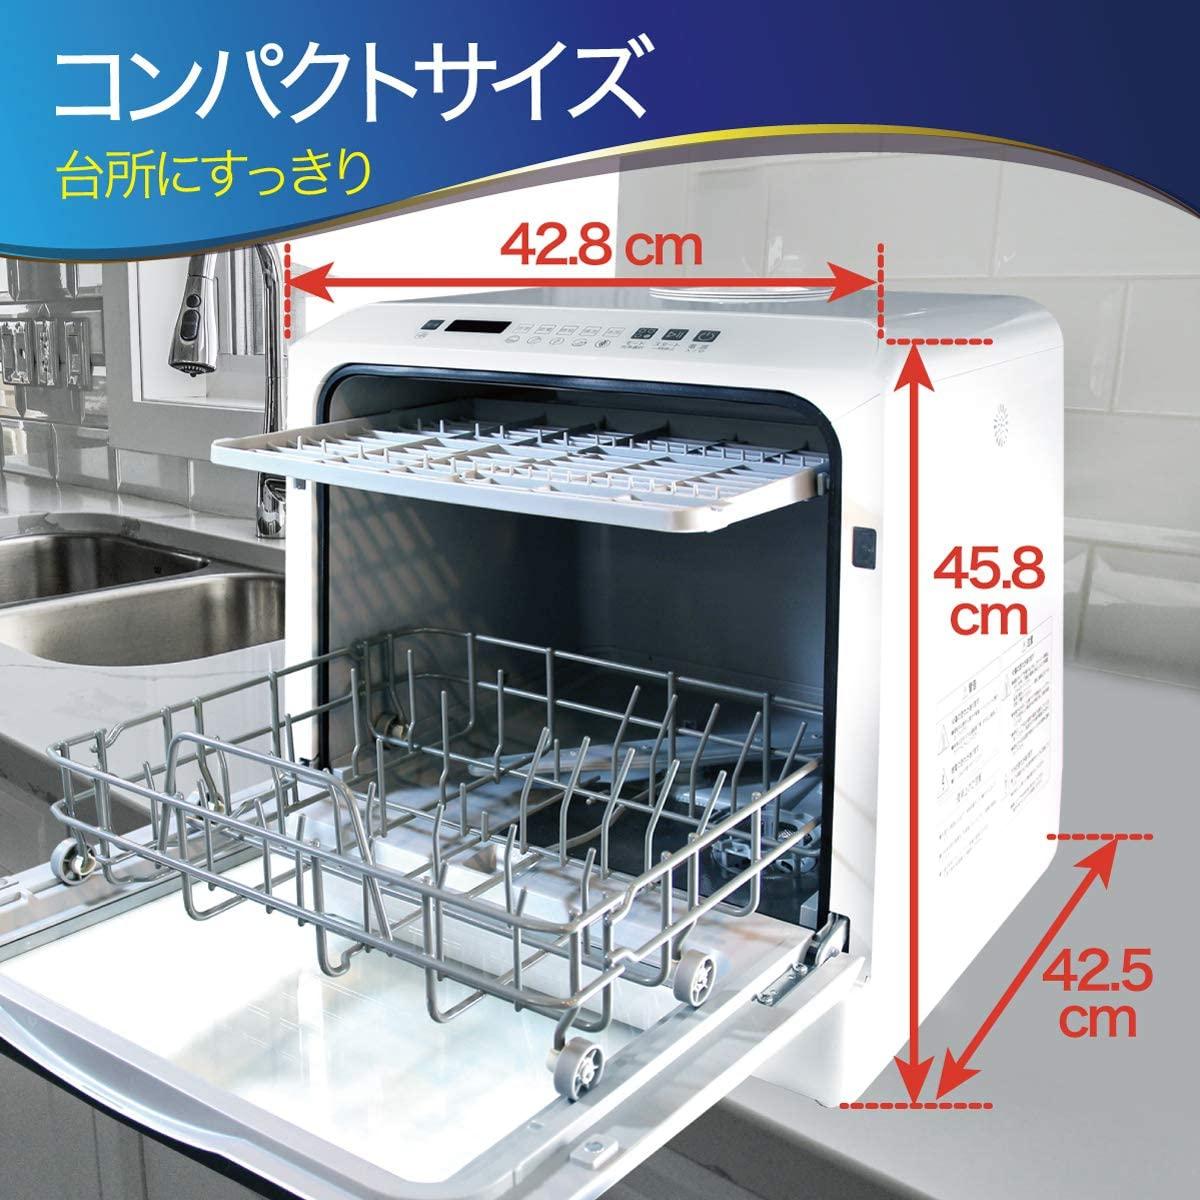 SOUYI(ソウイ) 食器洗い乾燥機 SY-118の商品画像4